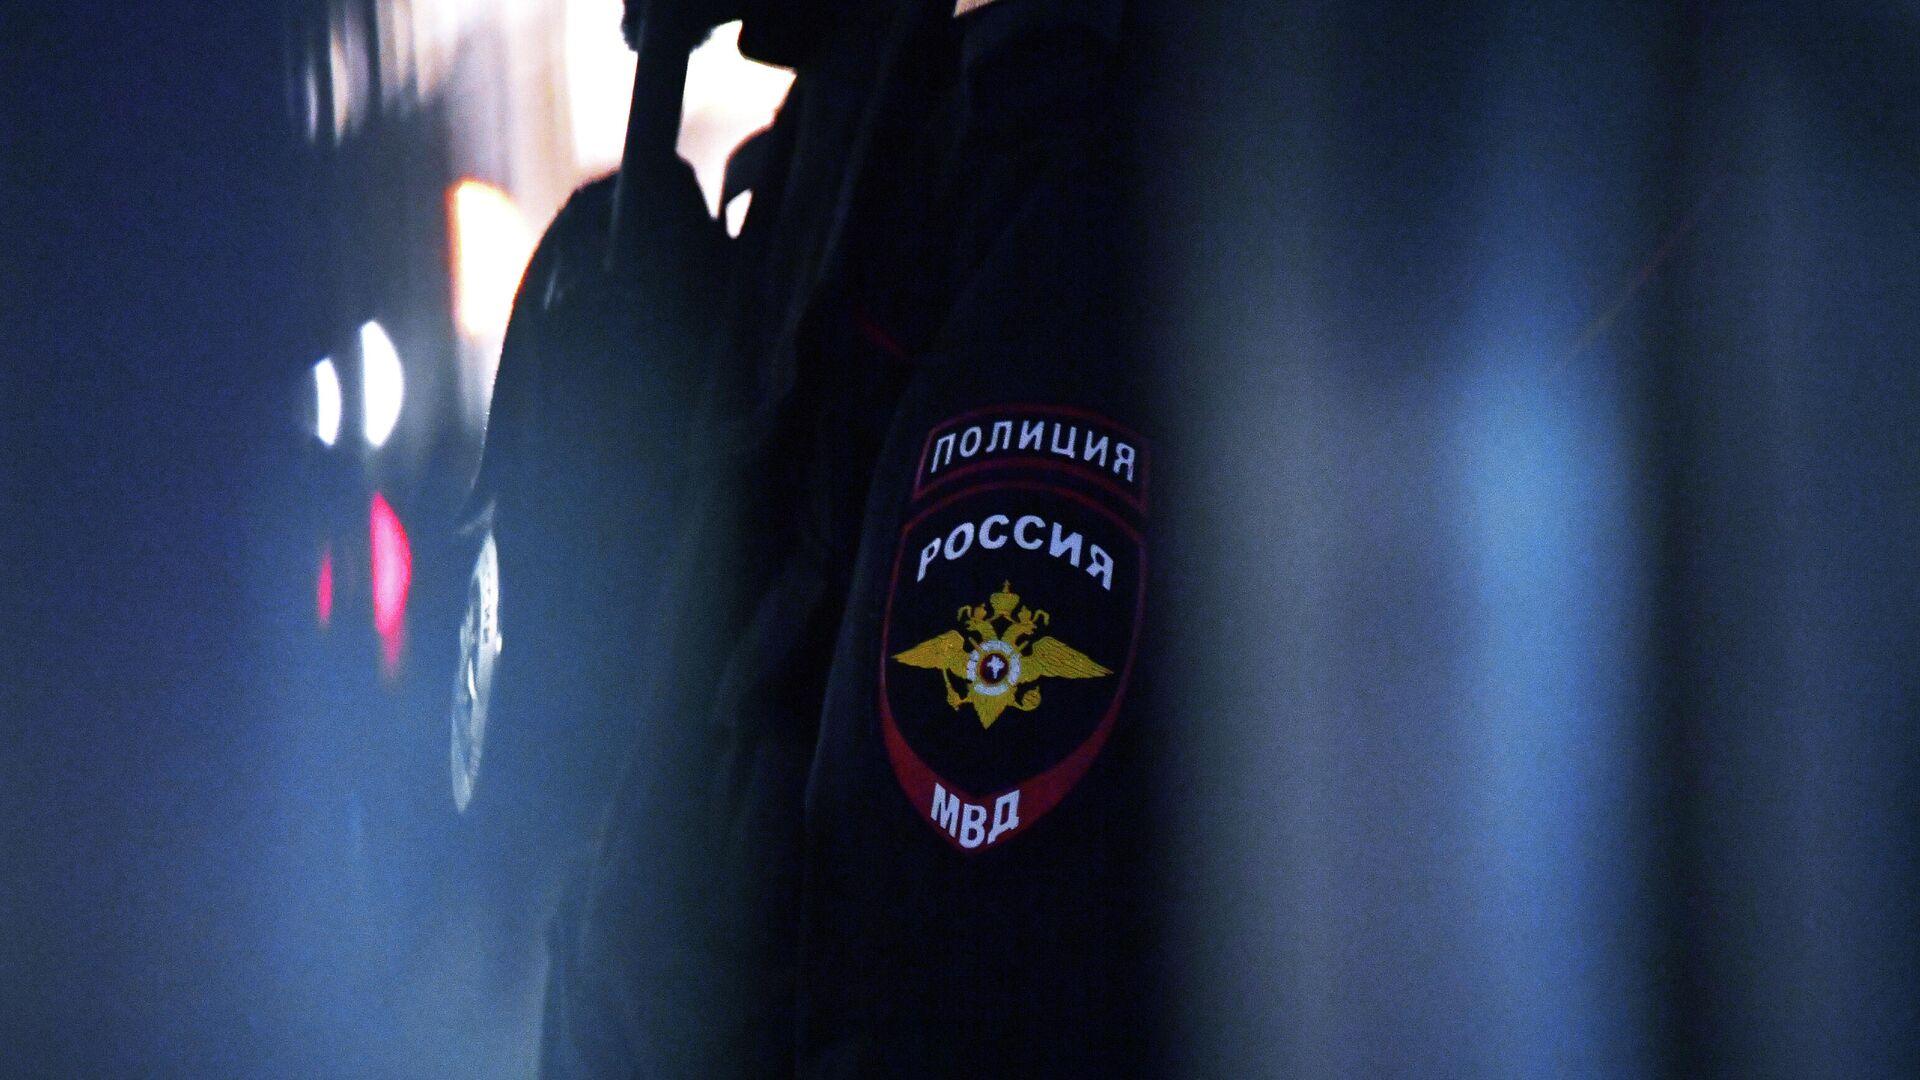 Эмблема на форме сотрудника полиции РФ - Sputnik Беларусь, 1920, 08.10.2021